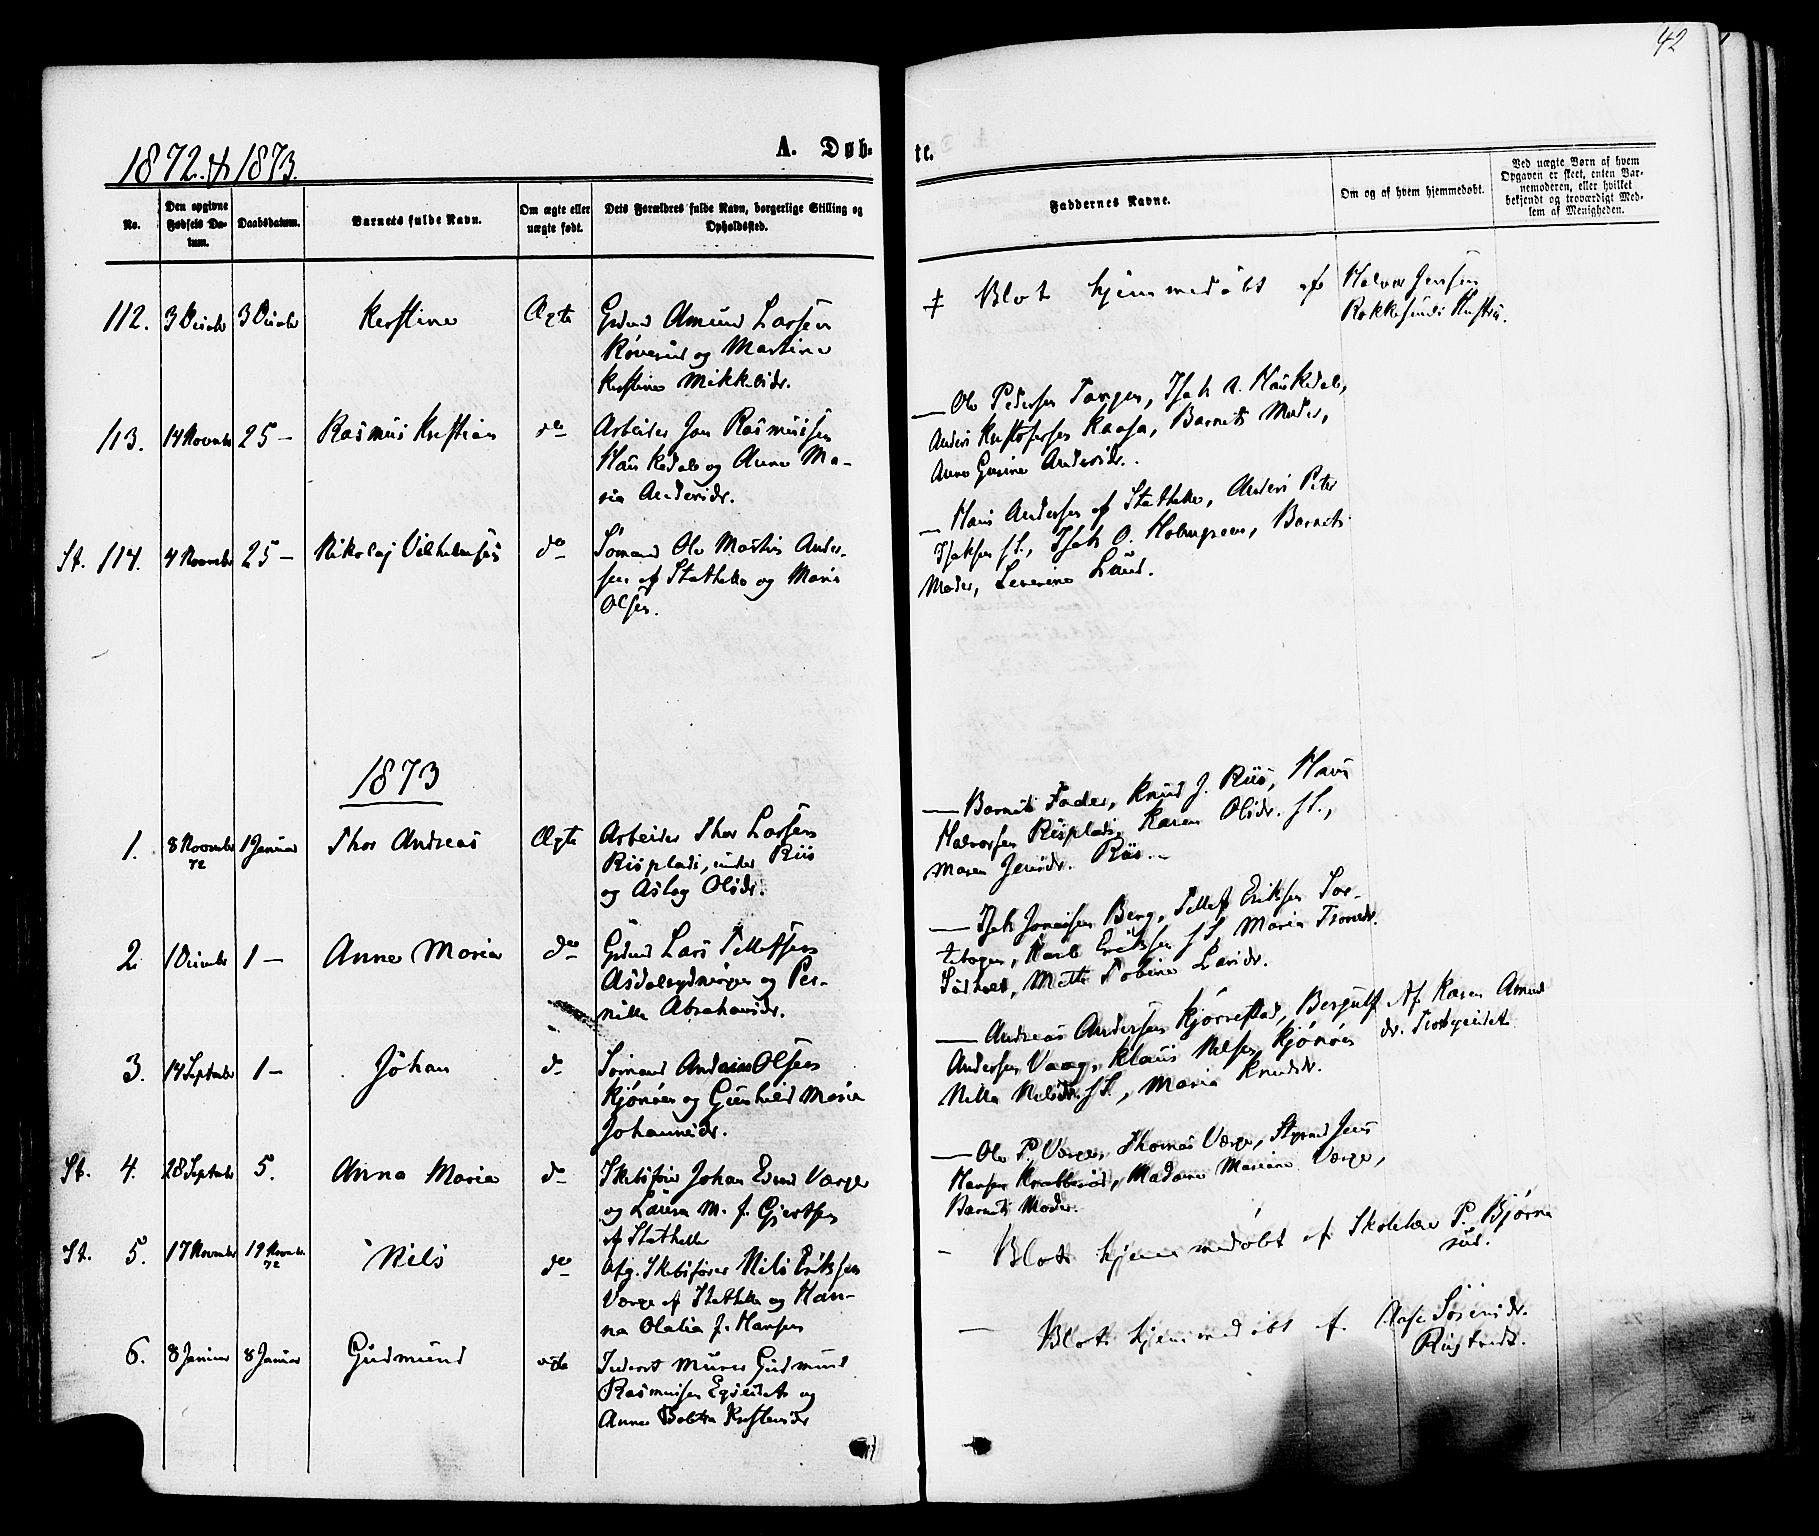 SAKO, Bamble kirkebøker, F/Fa/L0006: Ministerialbok nr. I 6, 1869-1877, s. 42